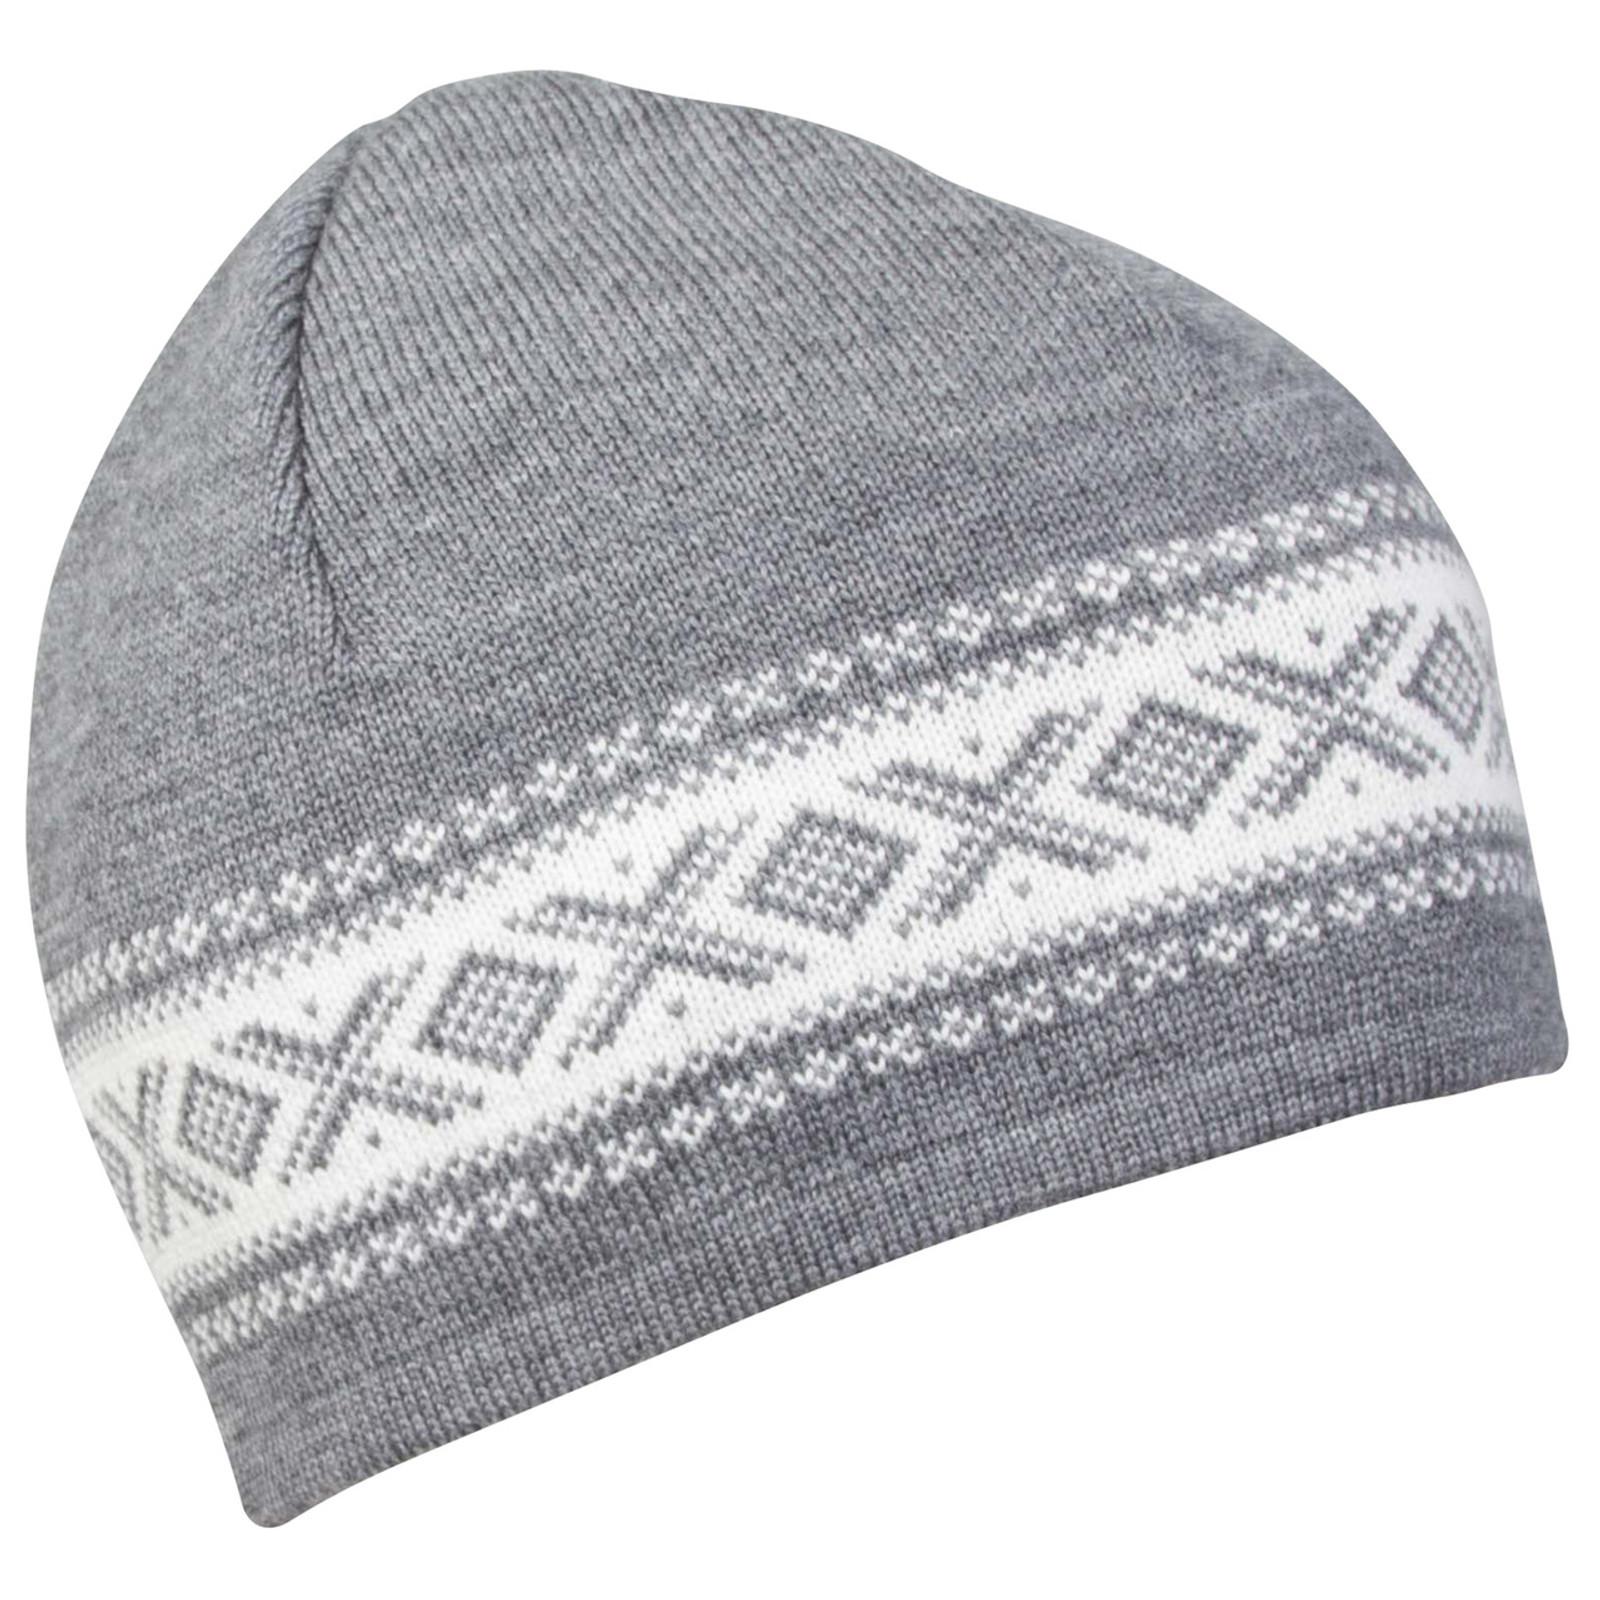 Dale of Norway, Cortina Merino Hat in Smoke/Off White, 48211-E